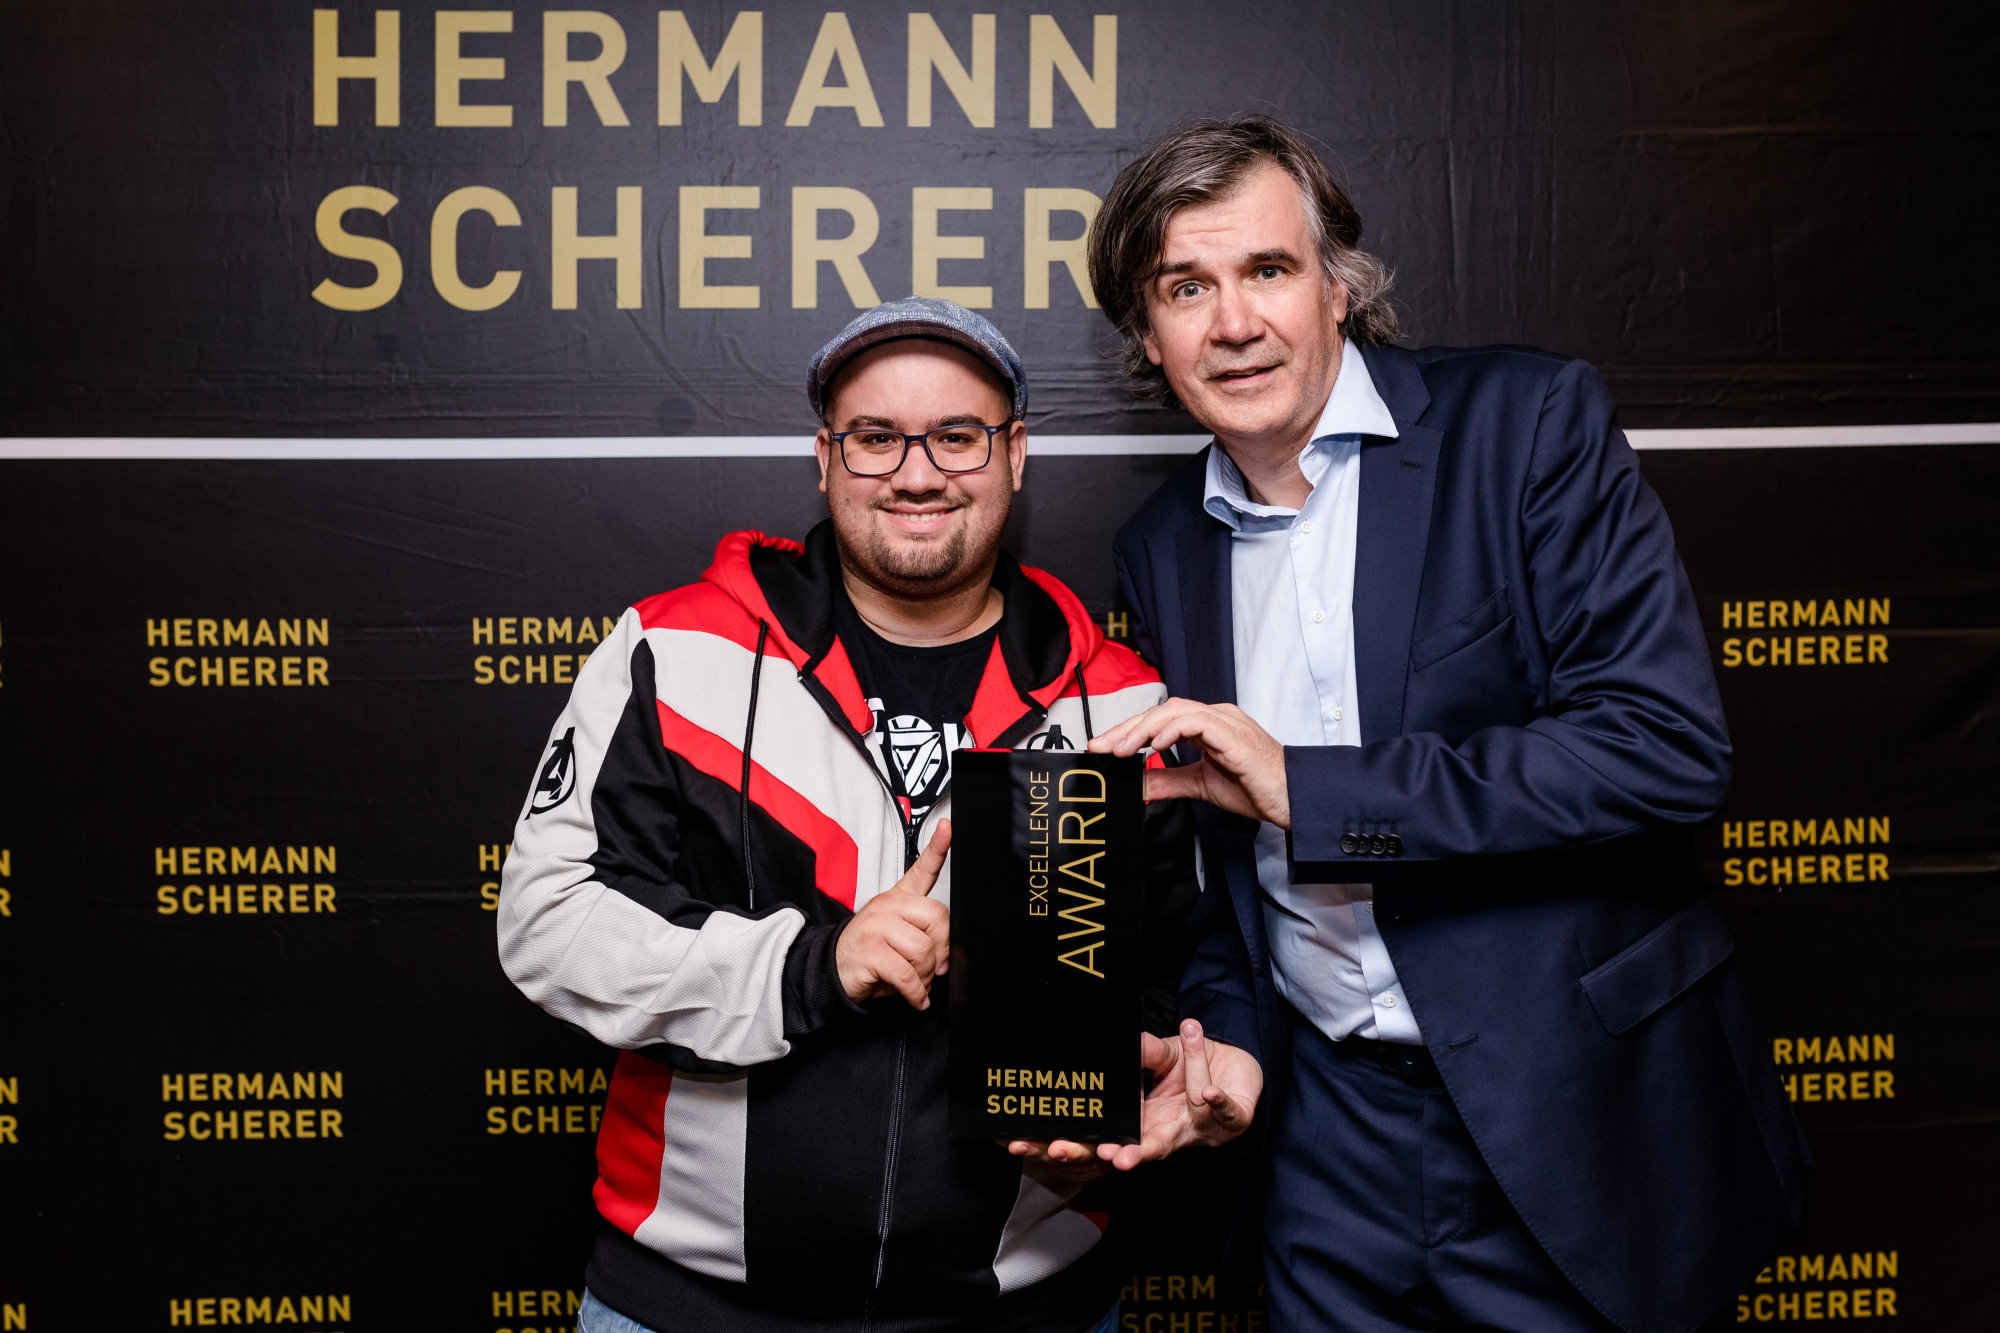 Sachse gewinnt Publikumspreis bei Speaker Weltrekord